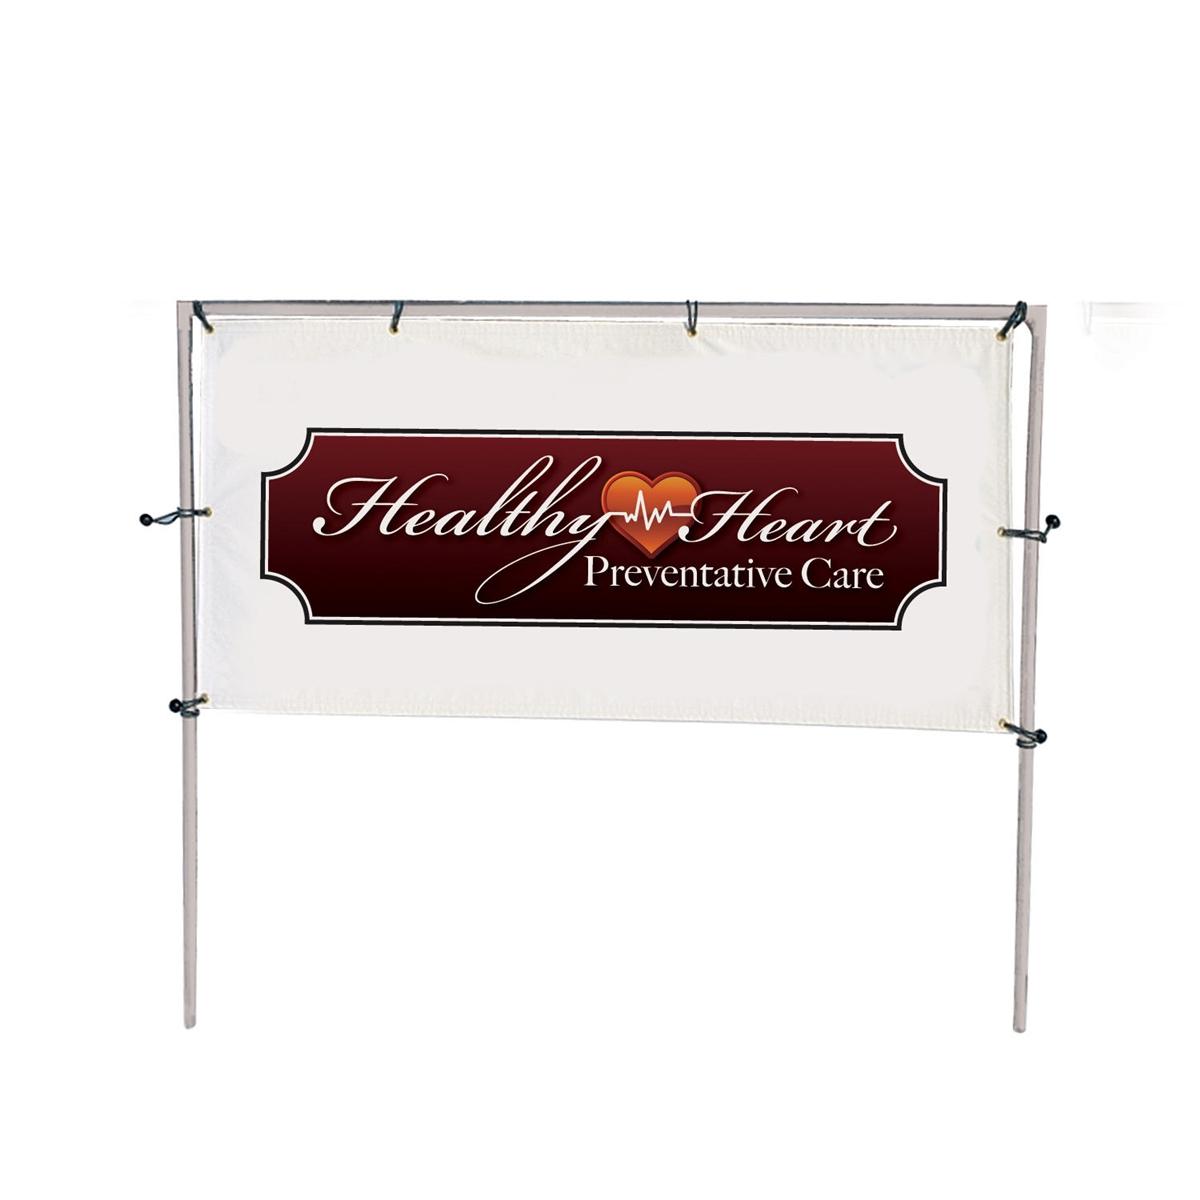 10ft (W) x 5ft (H) In-Ground Single Banner Frame Kit